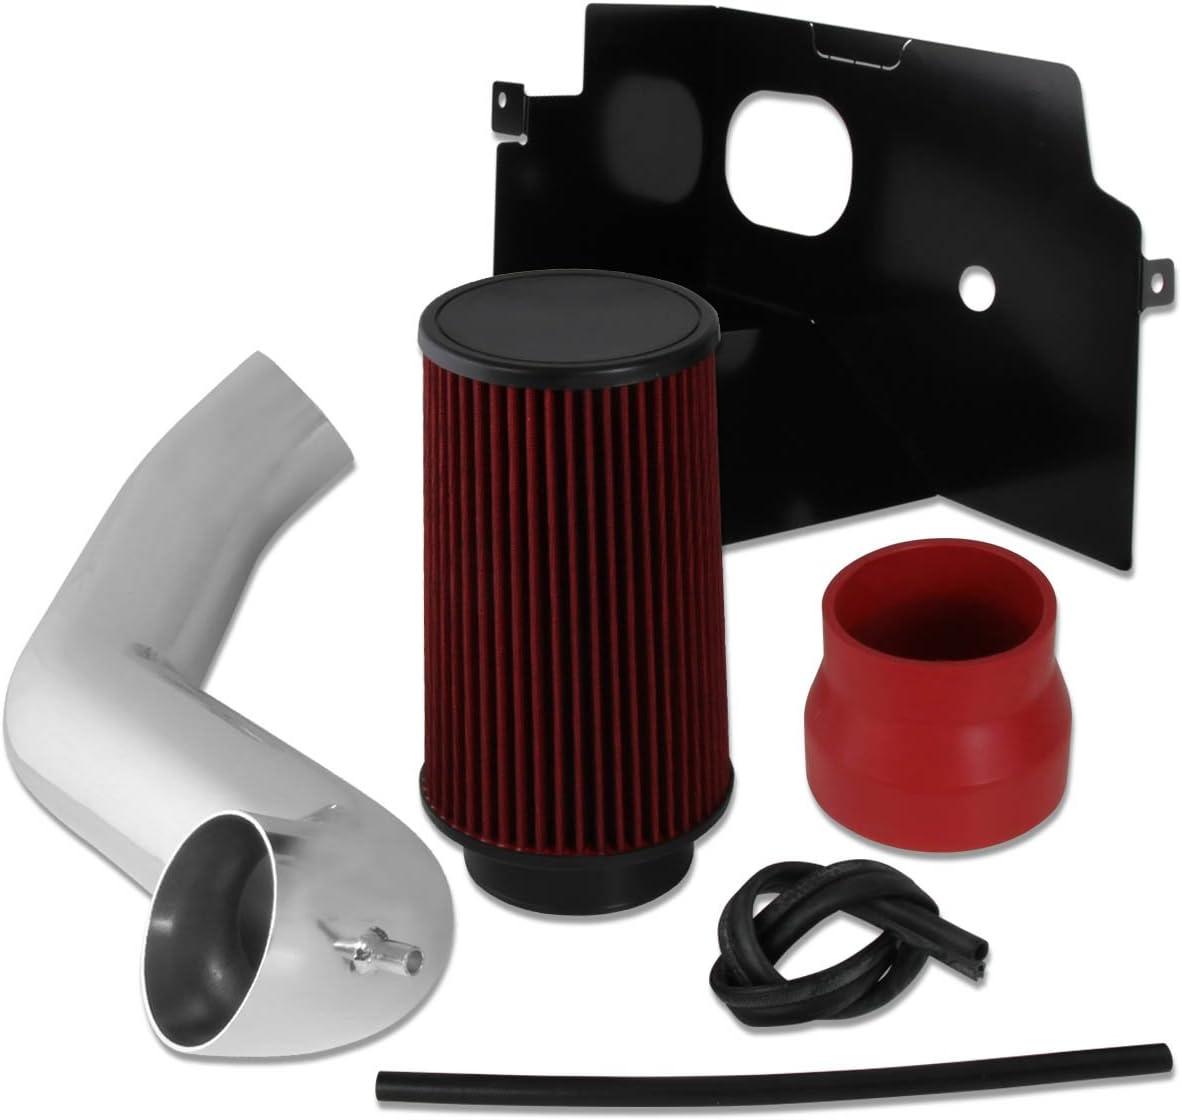 Cold Air Intake Kit+Heat Shield for 02-08 Dodge Ram 1500 2500 4.7L 5.7L V8 Blue